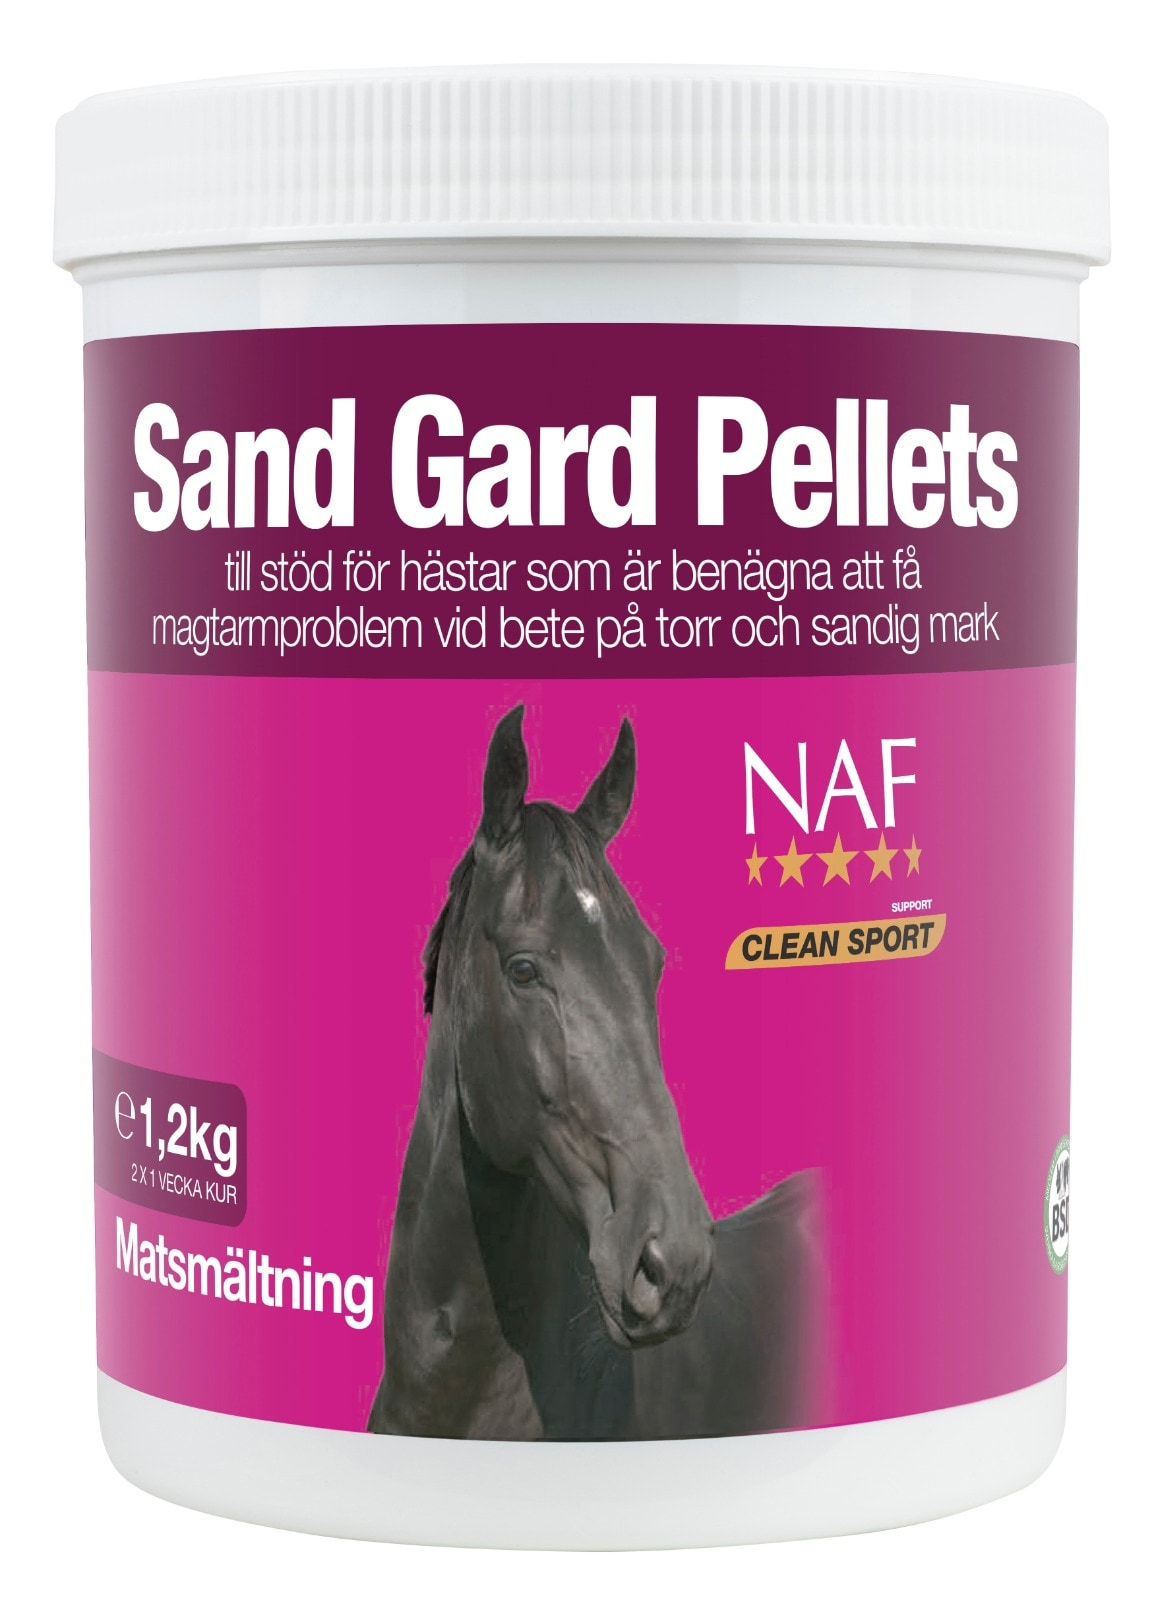 sand-gard-pellets-1,2-kg